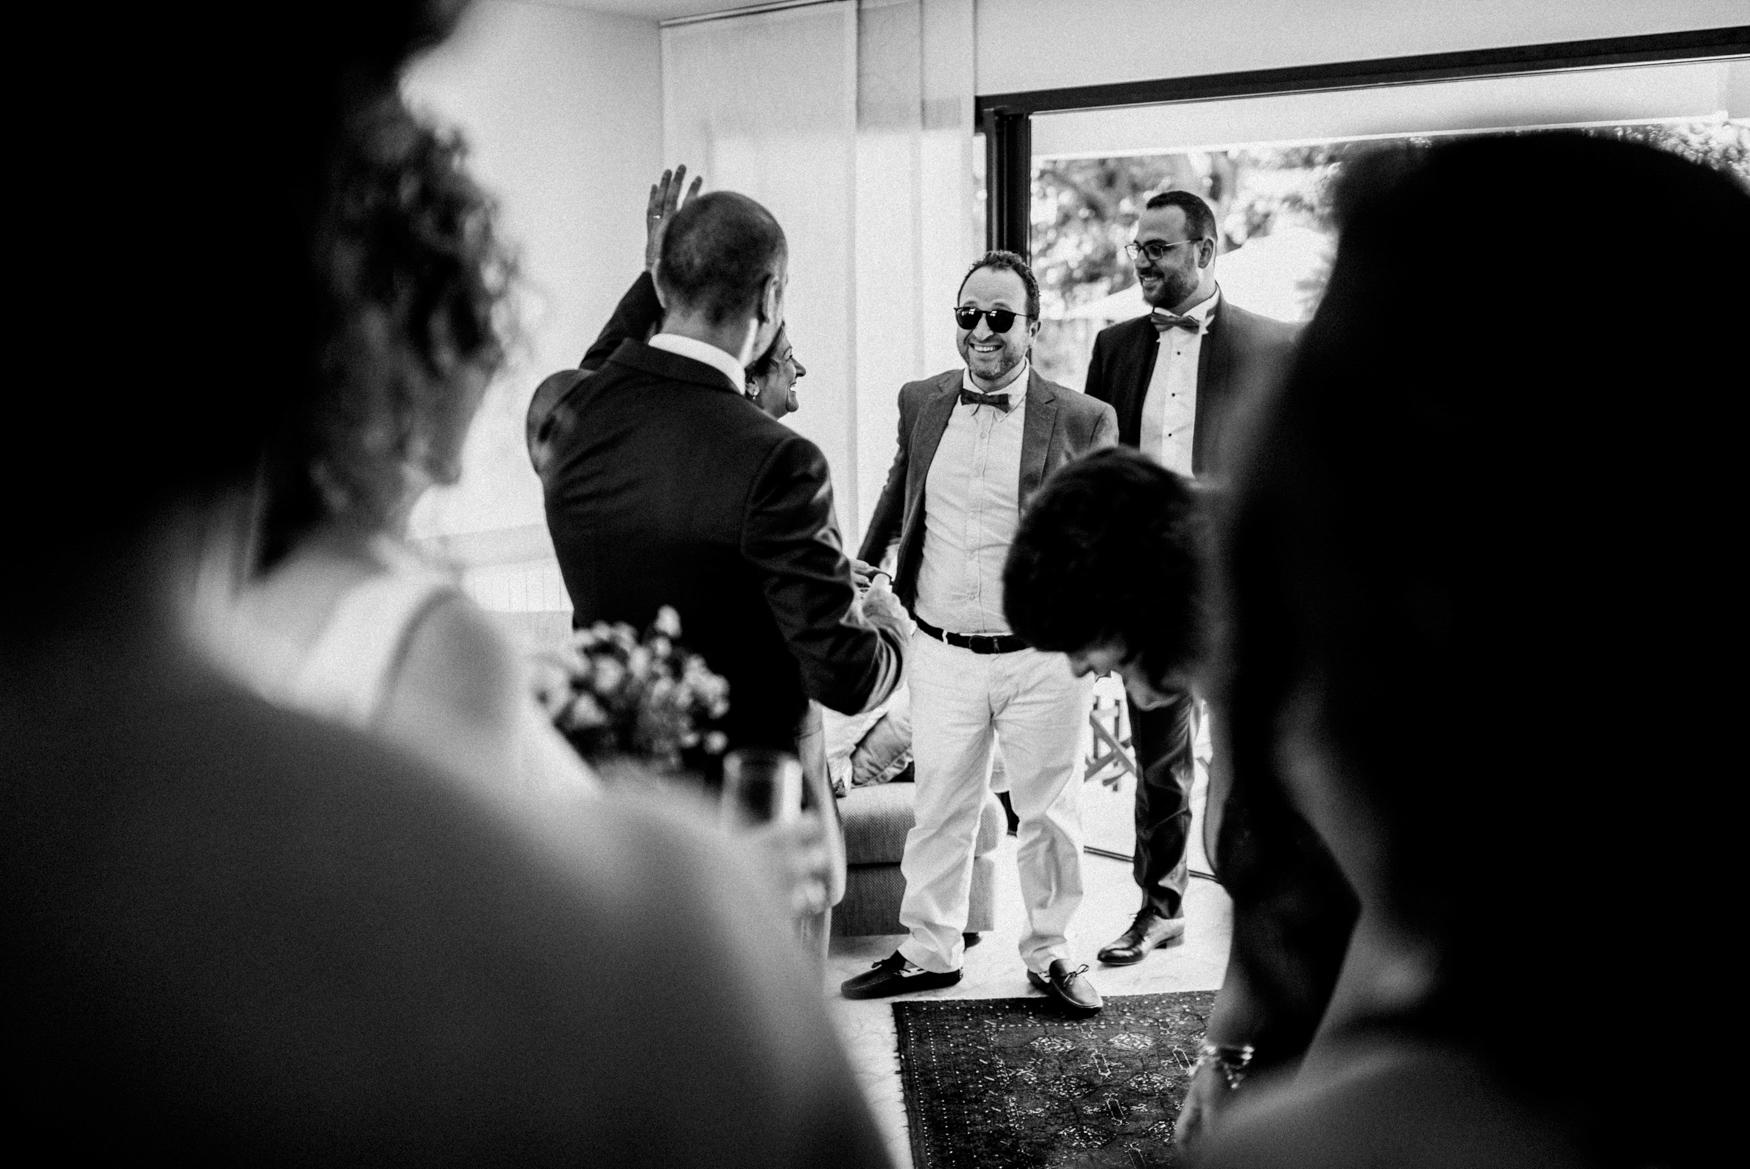 LR2 beirut byblos wedding photographer lebanon 021.jpg